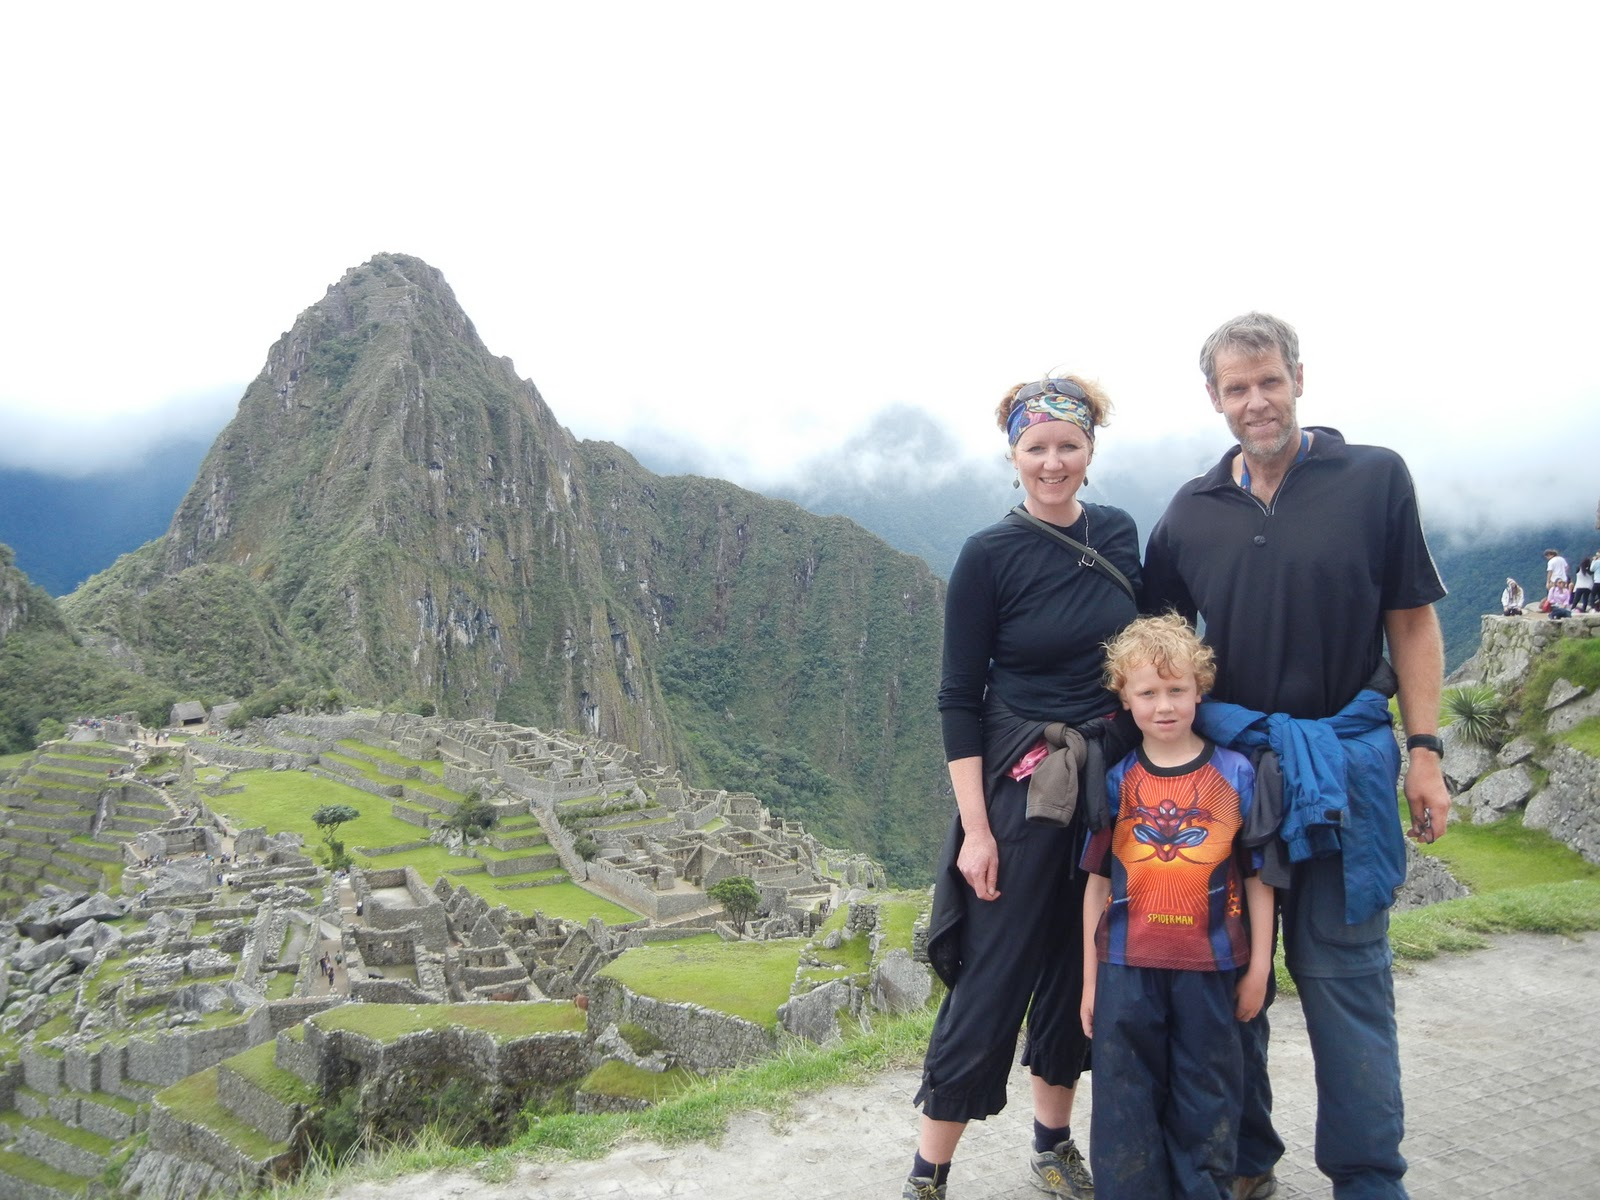 hola travel bug in and around cusco and machu picchu peru